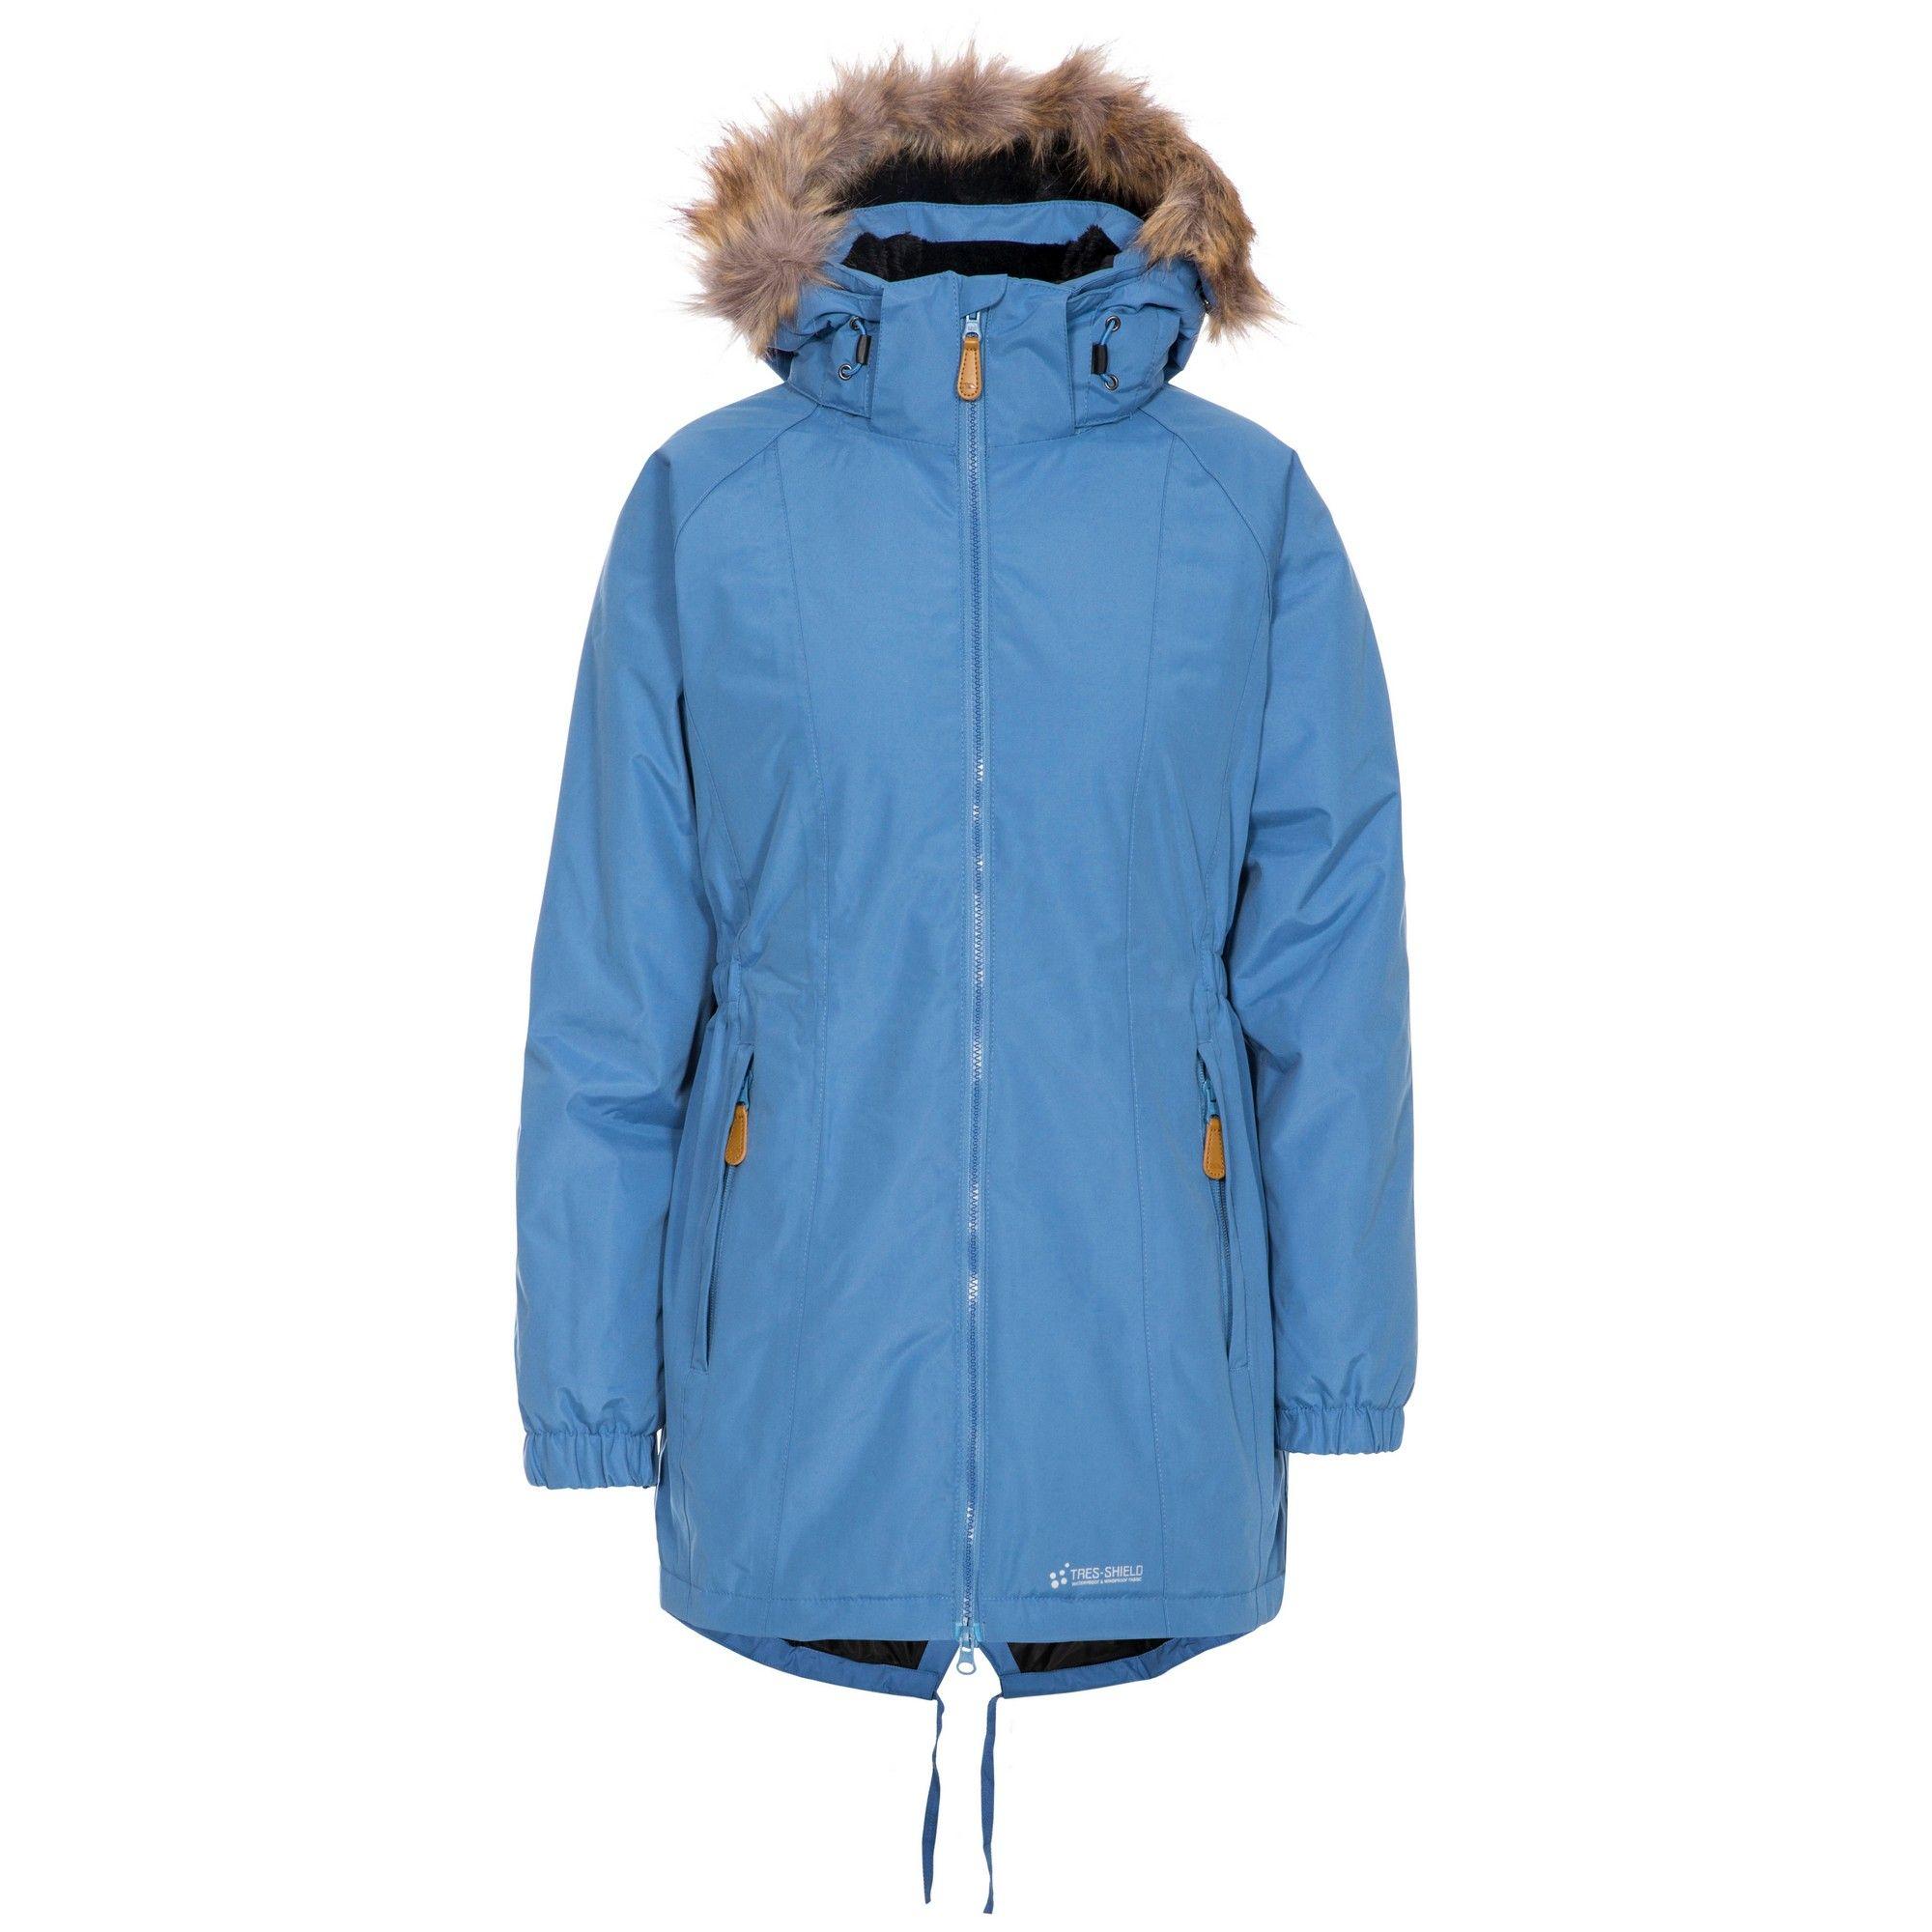 Trespass Women's Celebrity Insulated Longer Length Parka Jacket